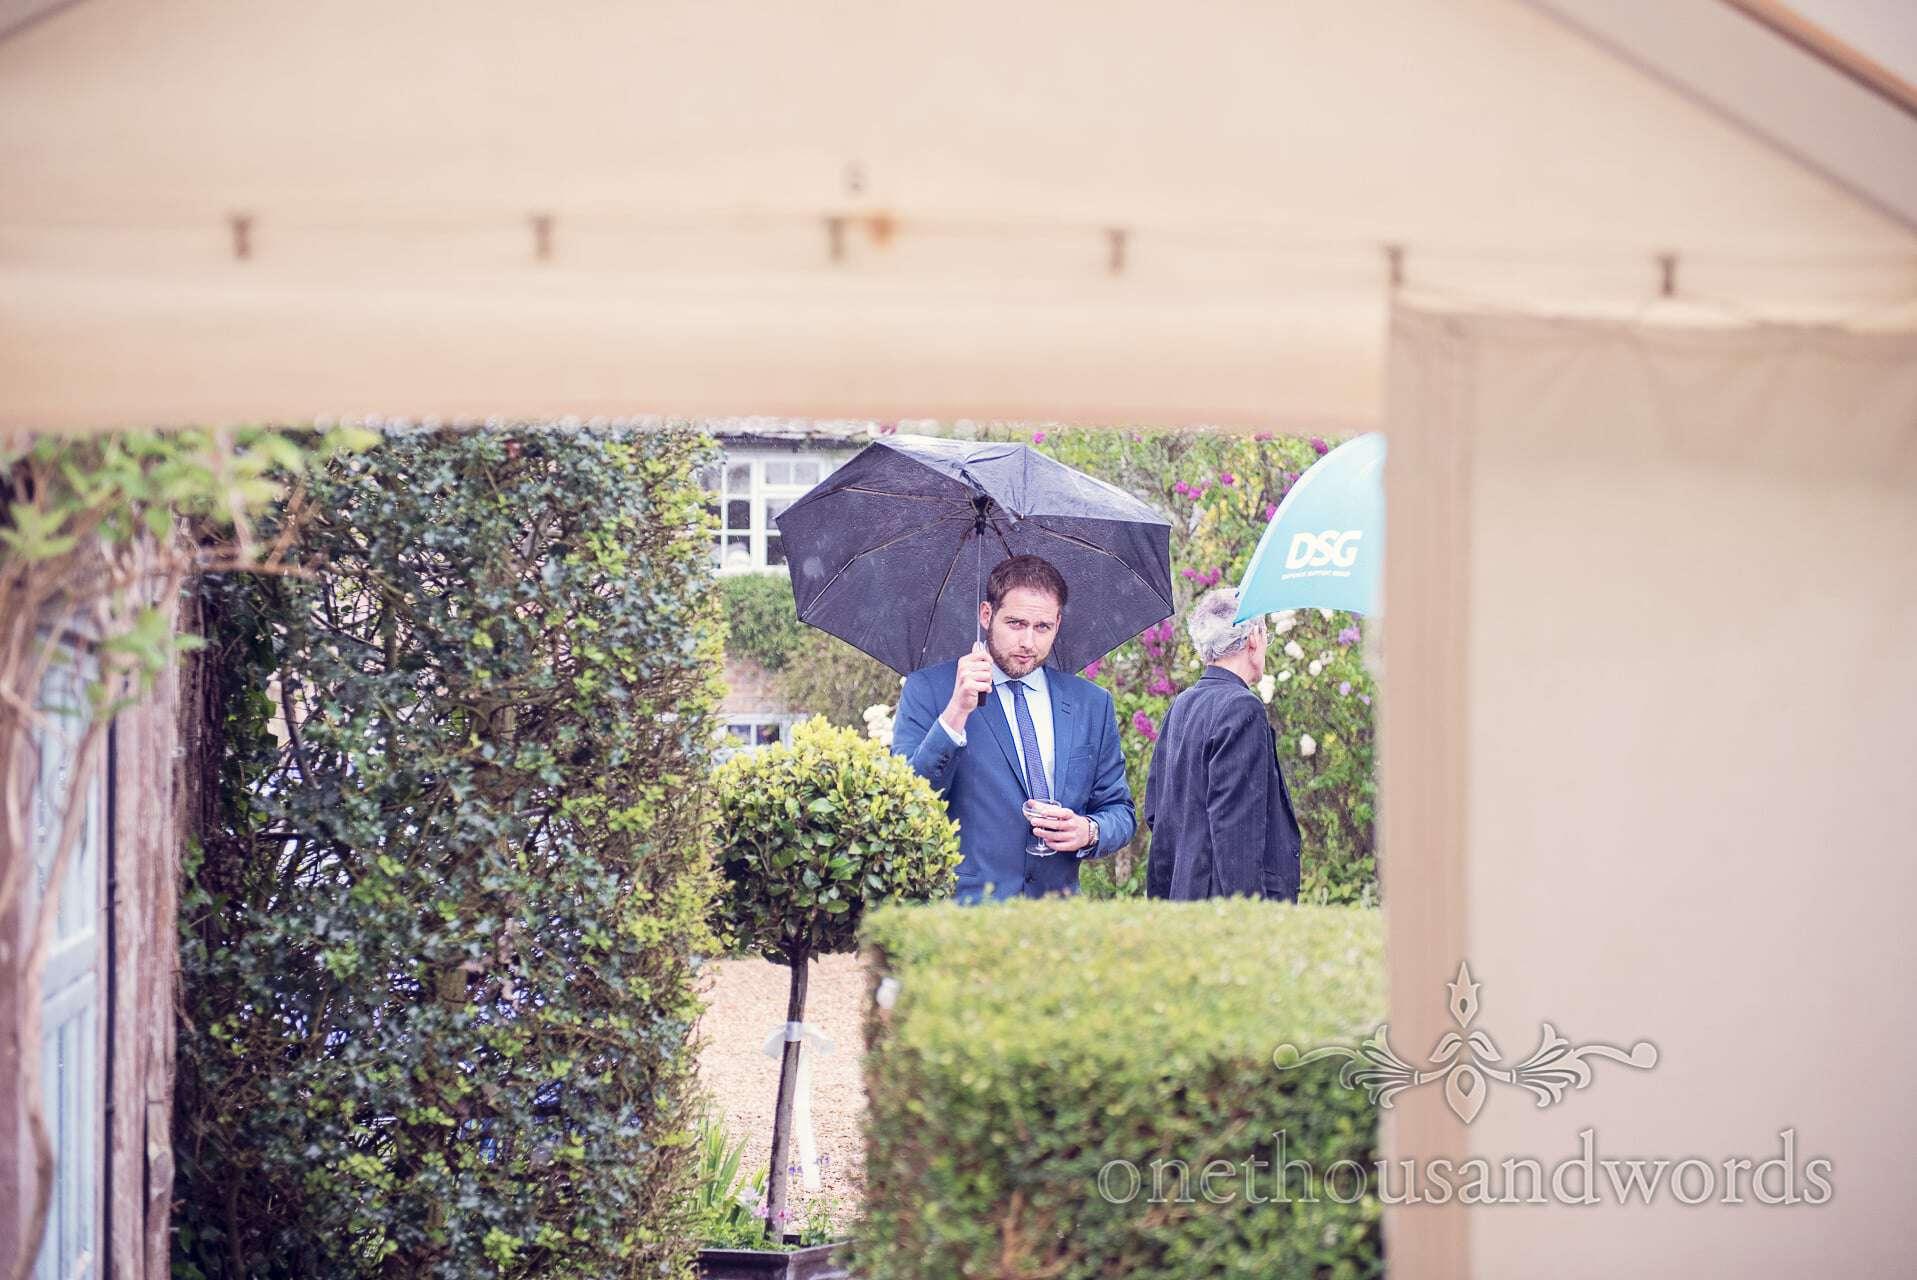 Wedding guest under umbrella at rainy wedding